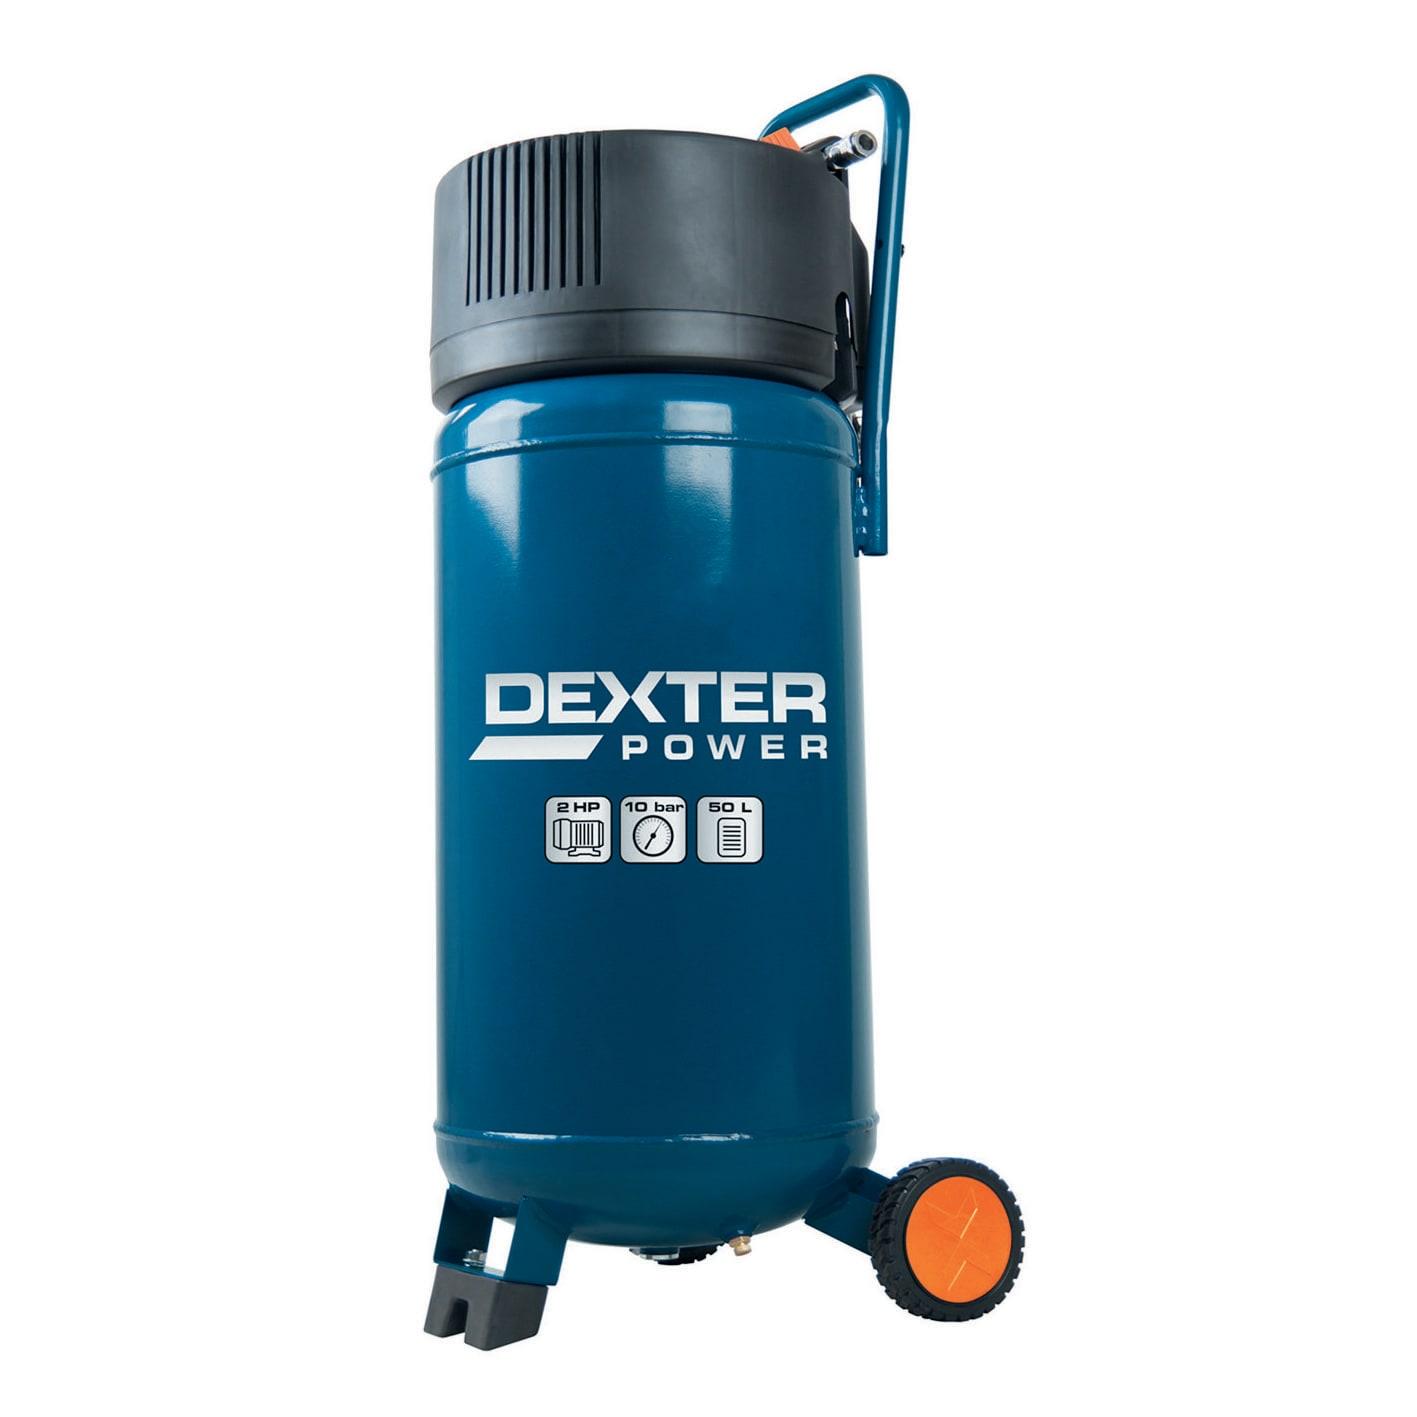 Compressore Coassiale Verticale Dexter Ac51v 2 Hp Pressione